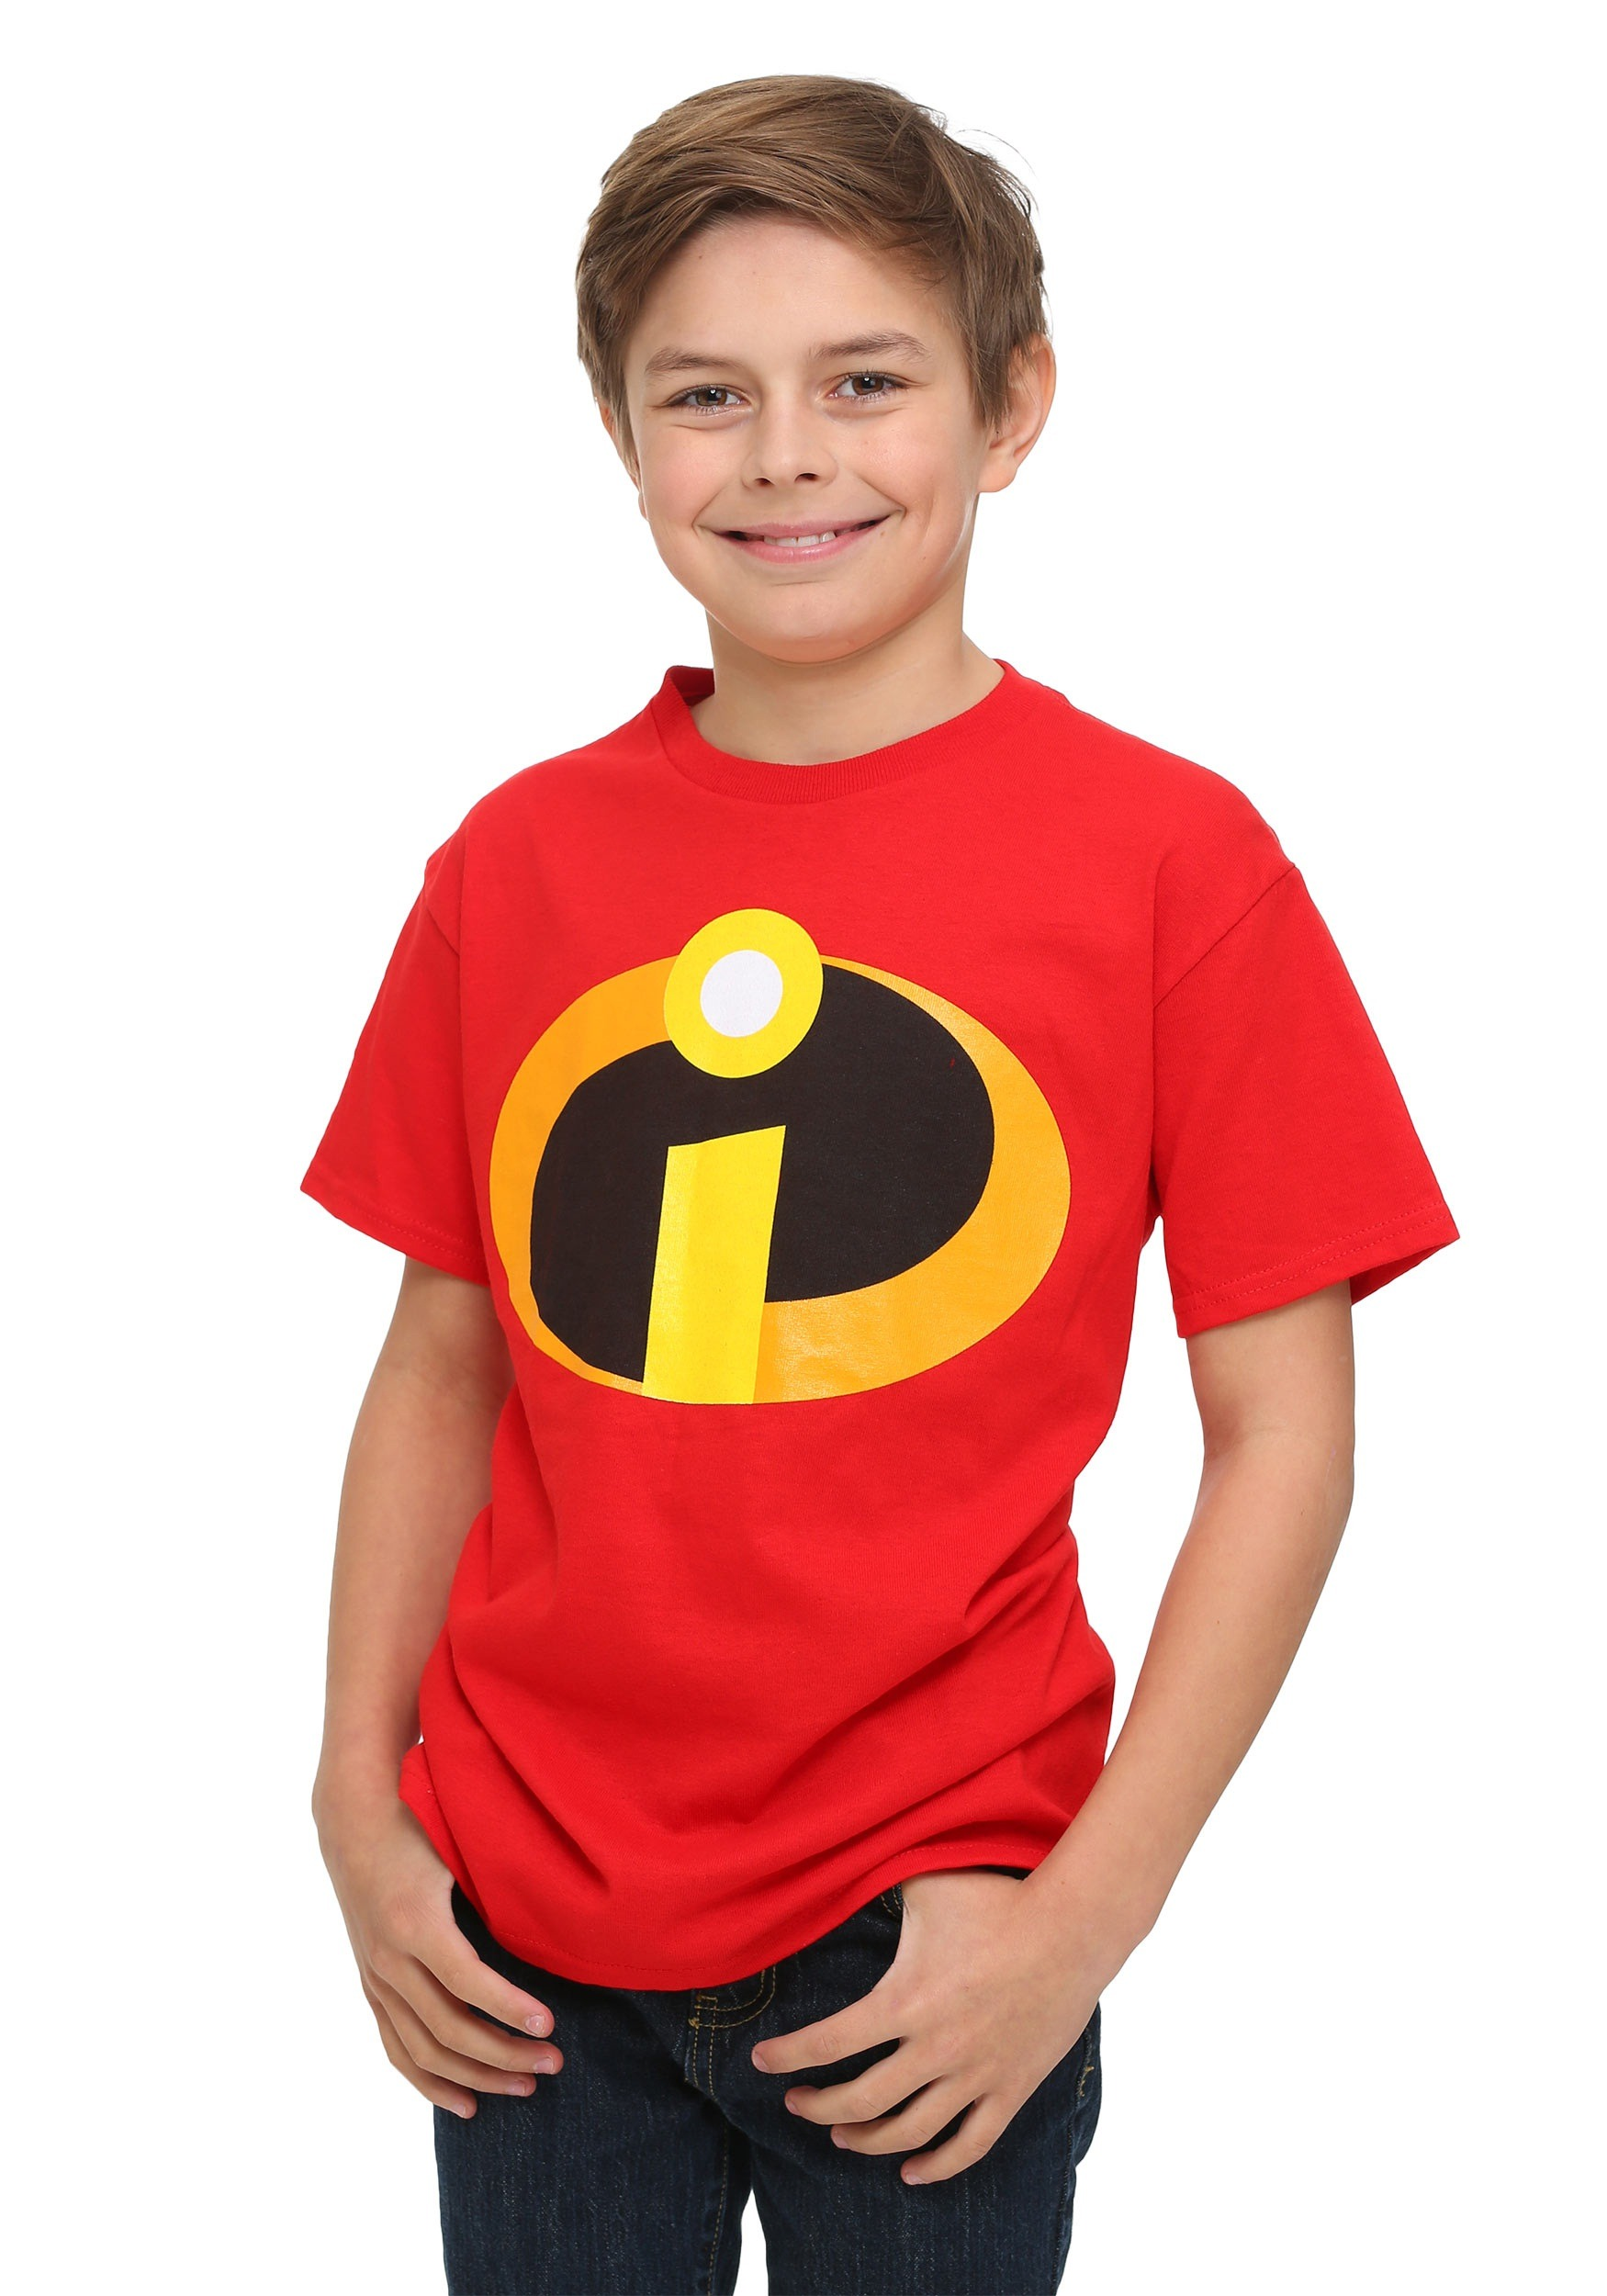 Incredibles Dash Costume Incredibles Costume Tshirt